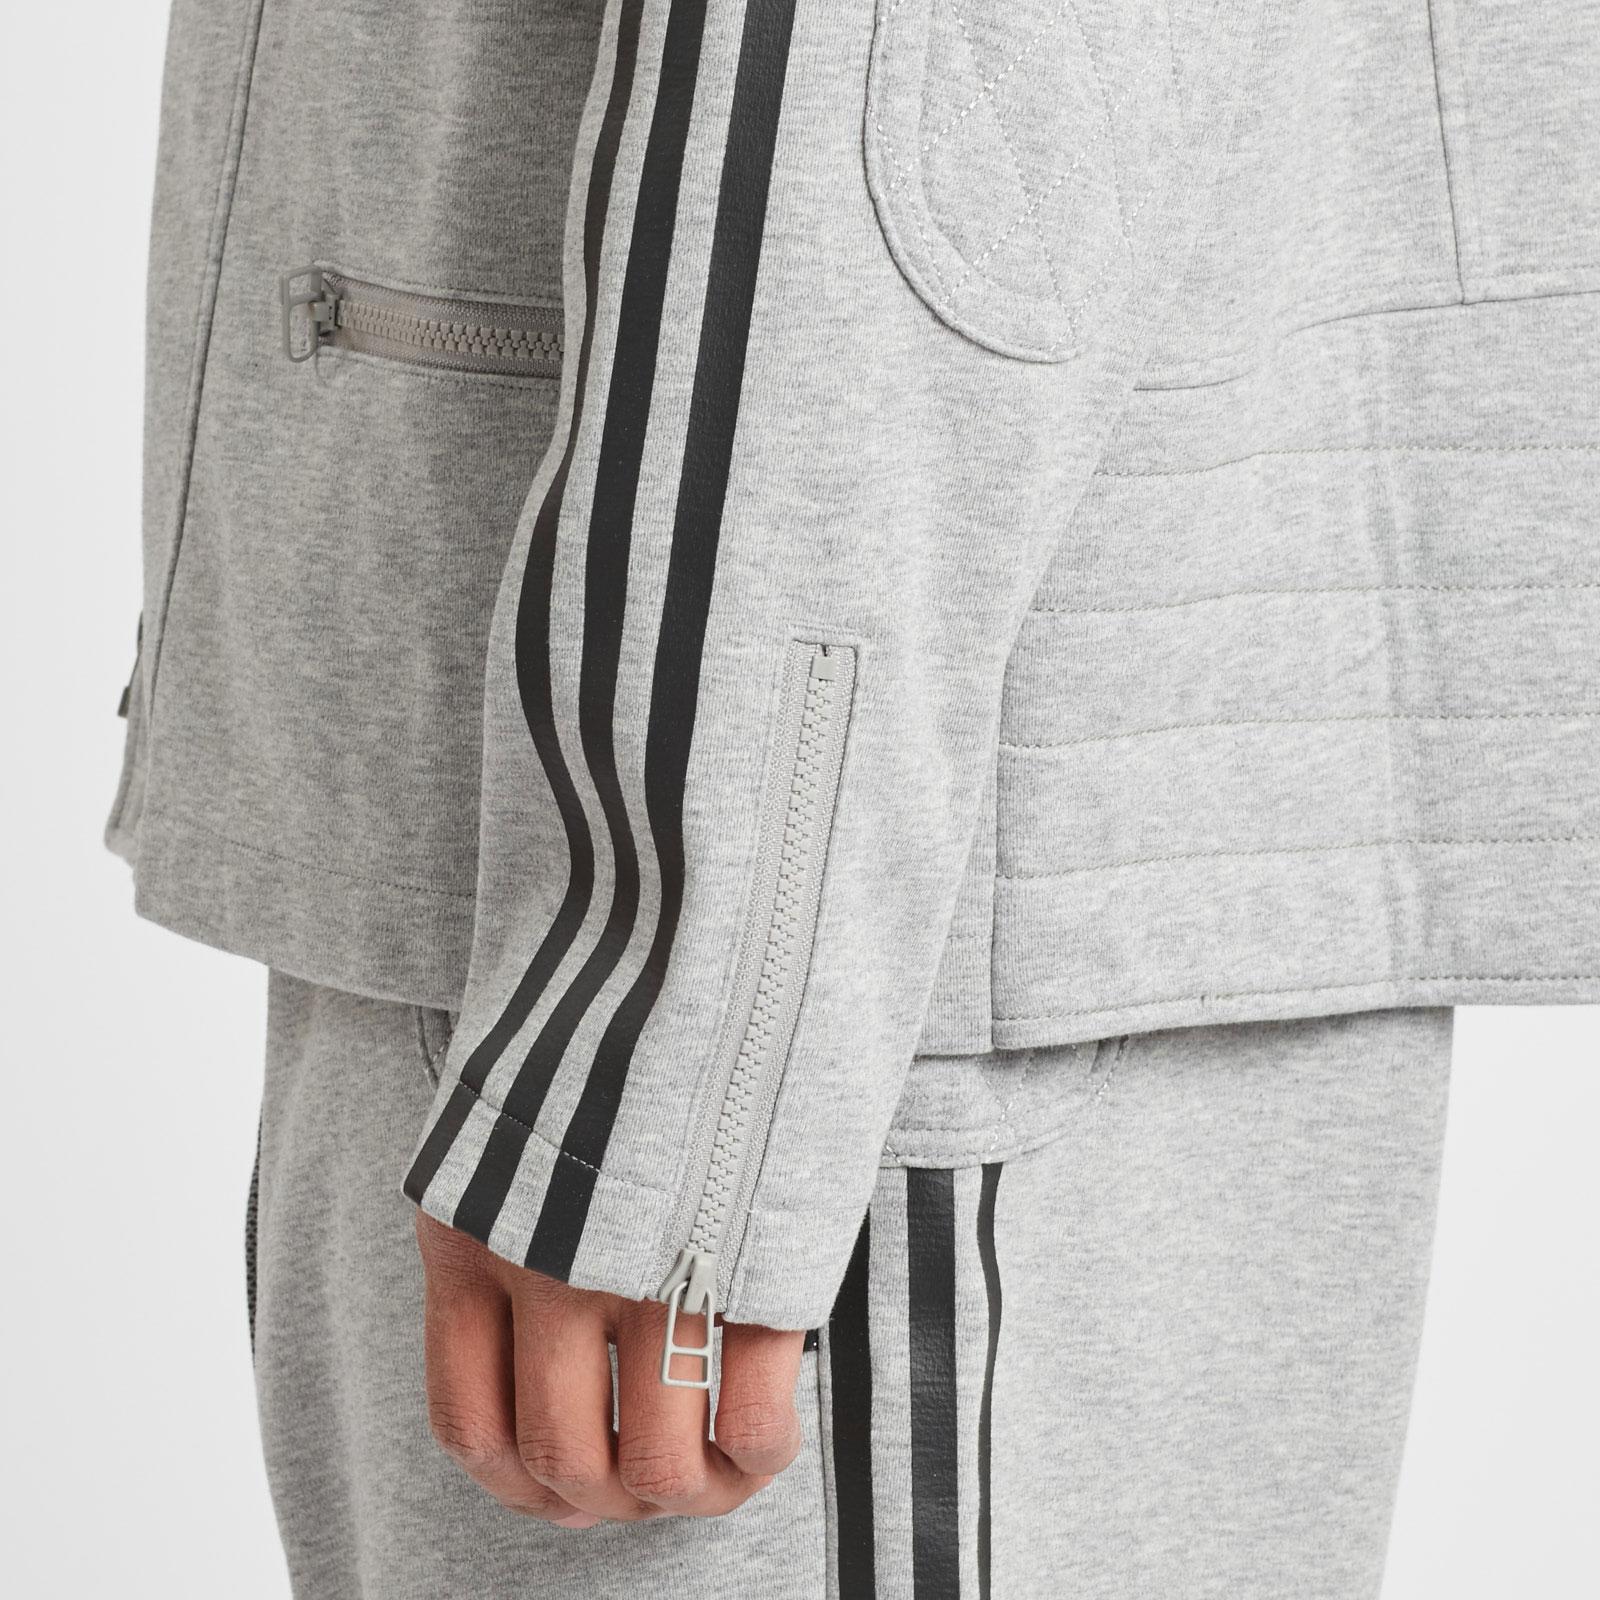 f86d7c7e4f3d adidas Riders Track Jacket x Neighborhood - Cd7736 - Sneakersnstuff ...